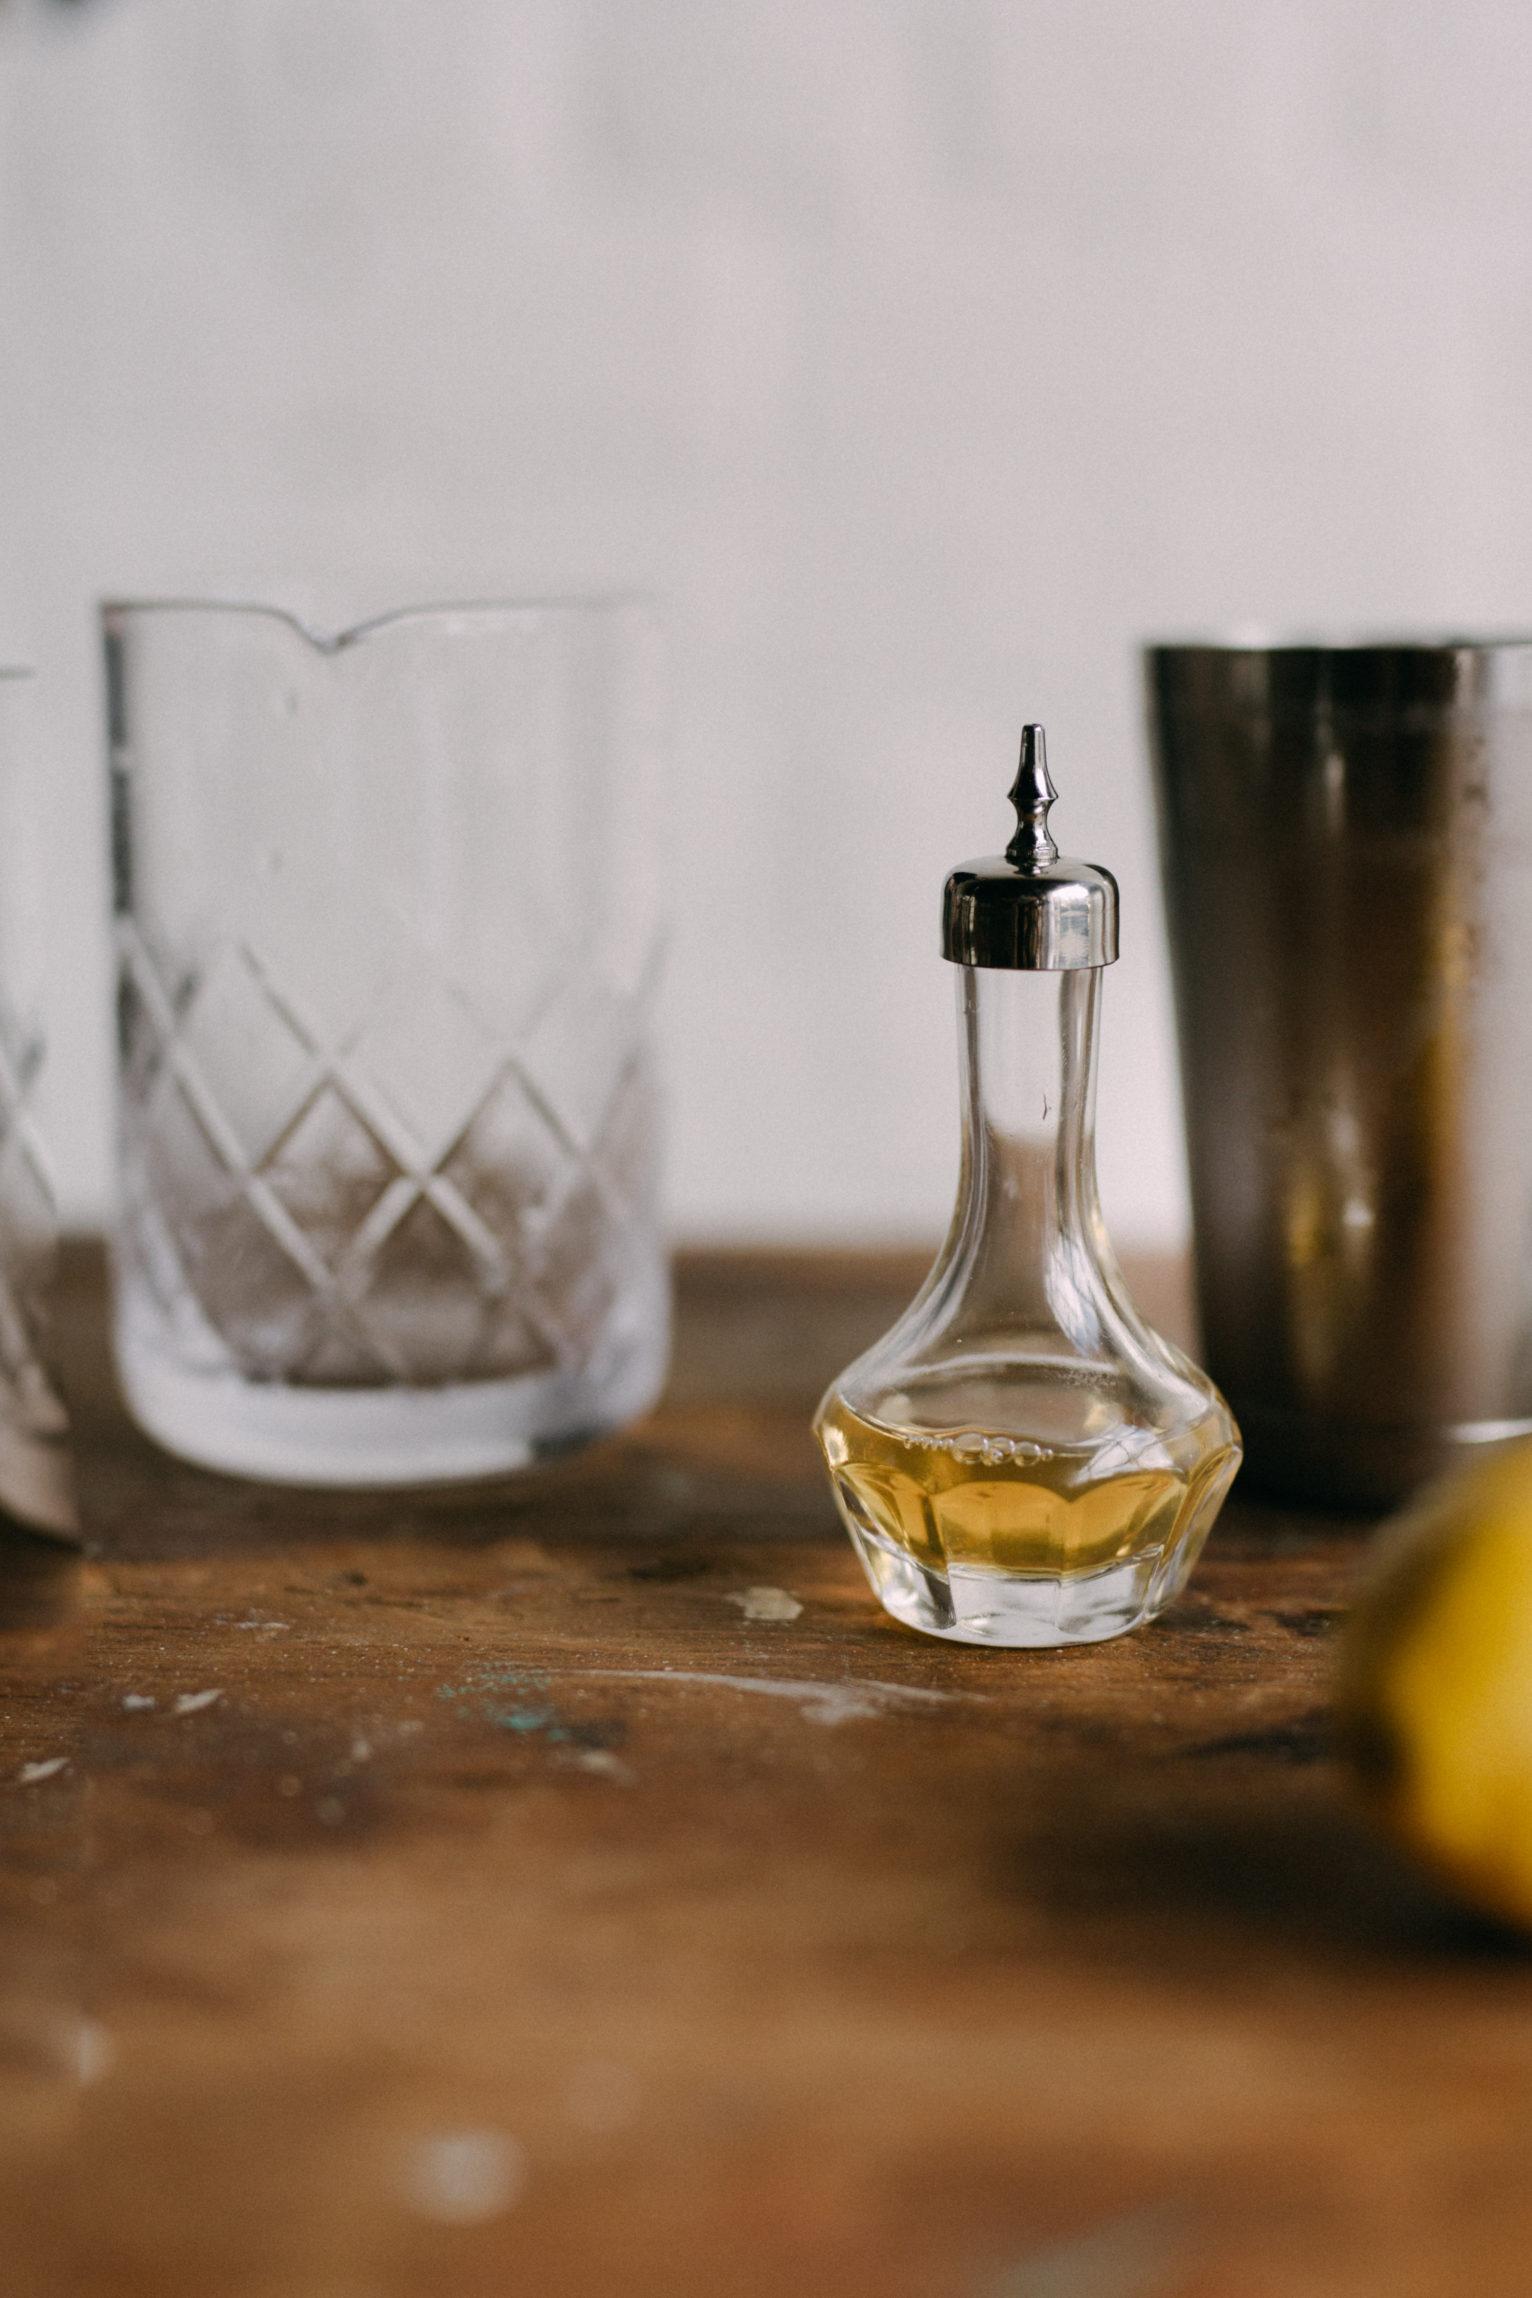 Bitters dasher bottle